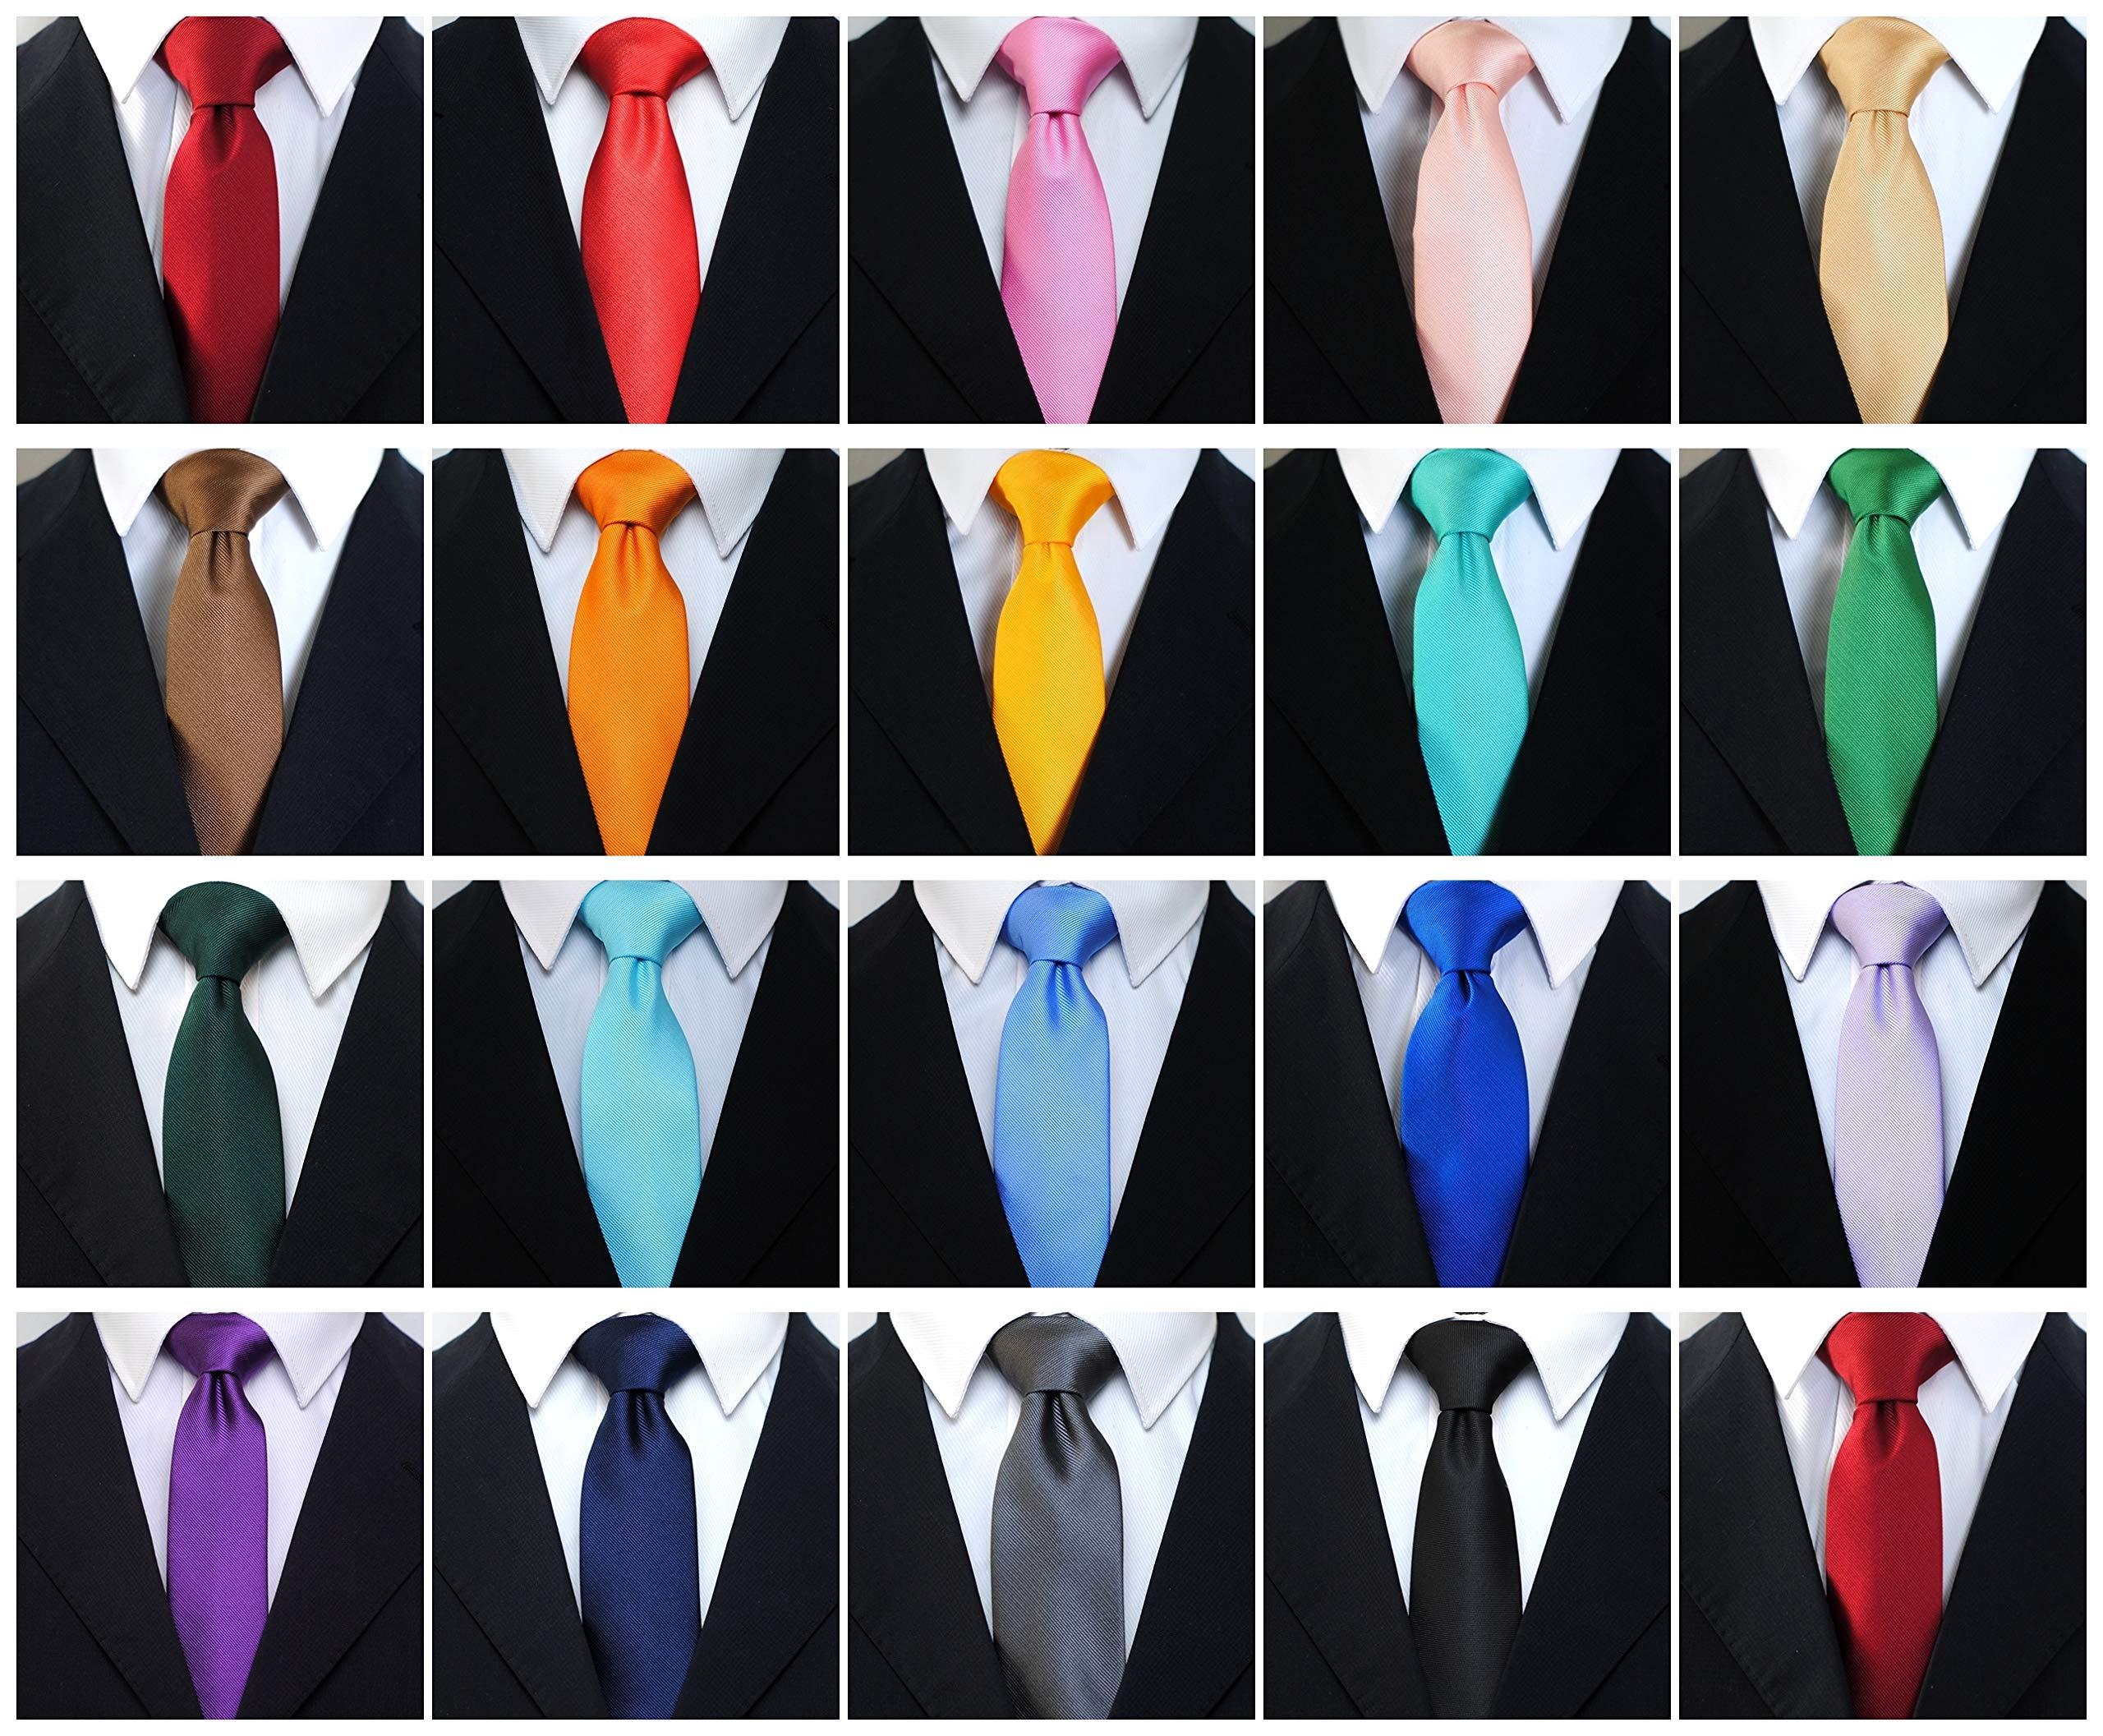 Skinny Solid Color Neckties Wedding Ties for Groomsmen 5 Pack ST518 by ZENXUS (Image #4)